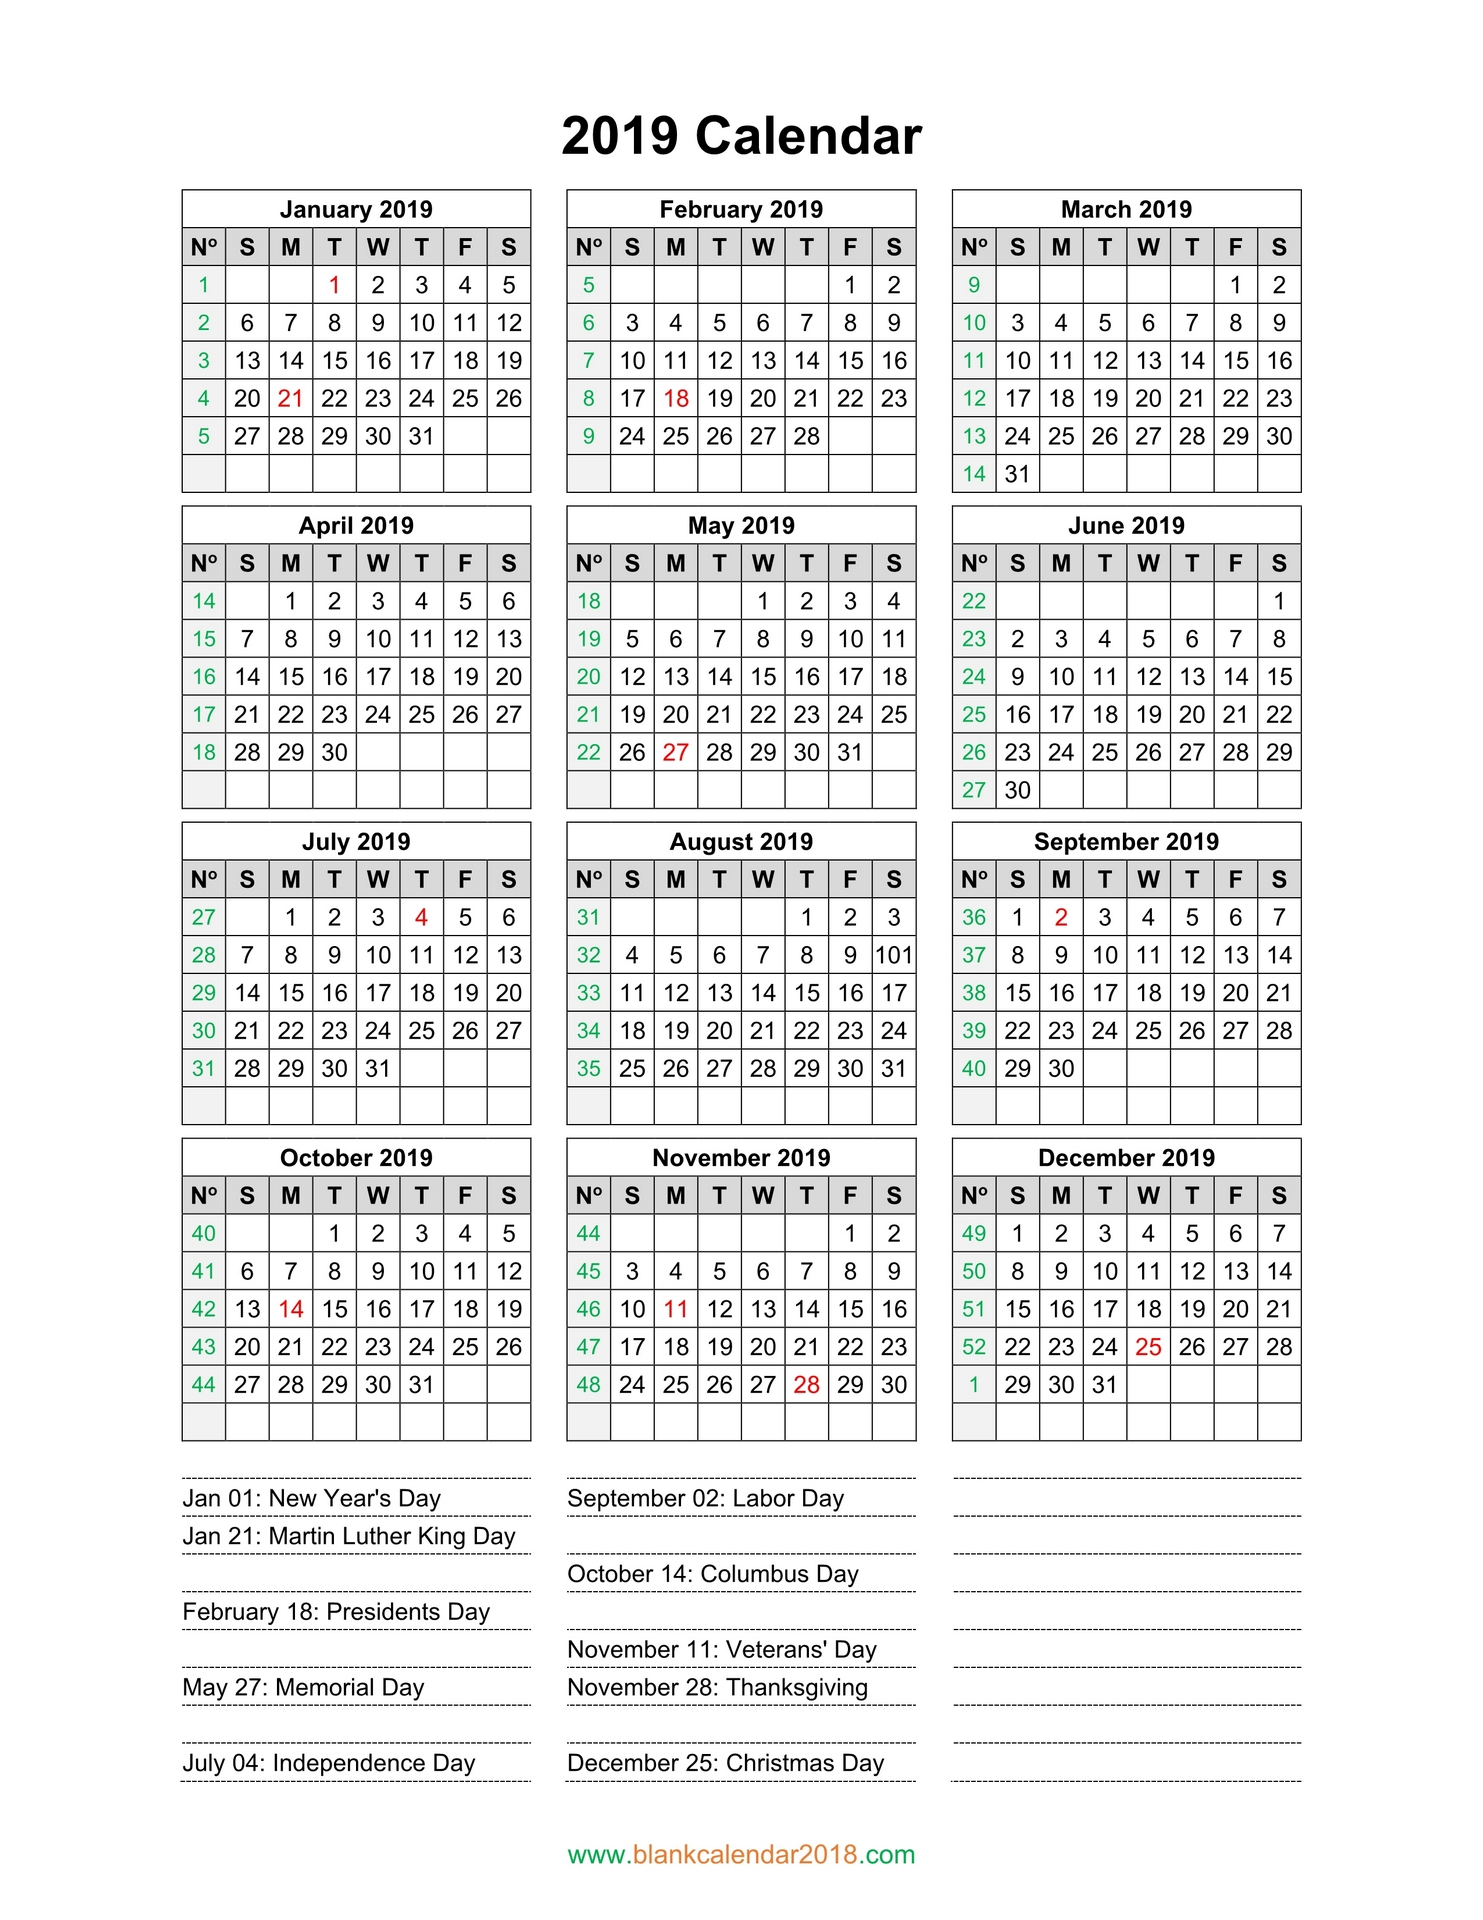 2019 Calendar Template Free Stock Photo - Public Domain ...